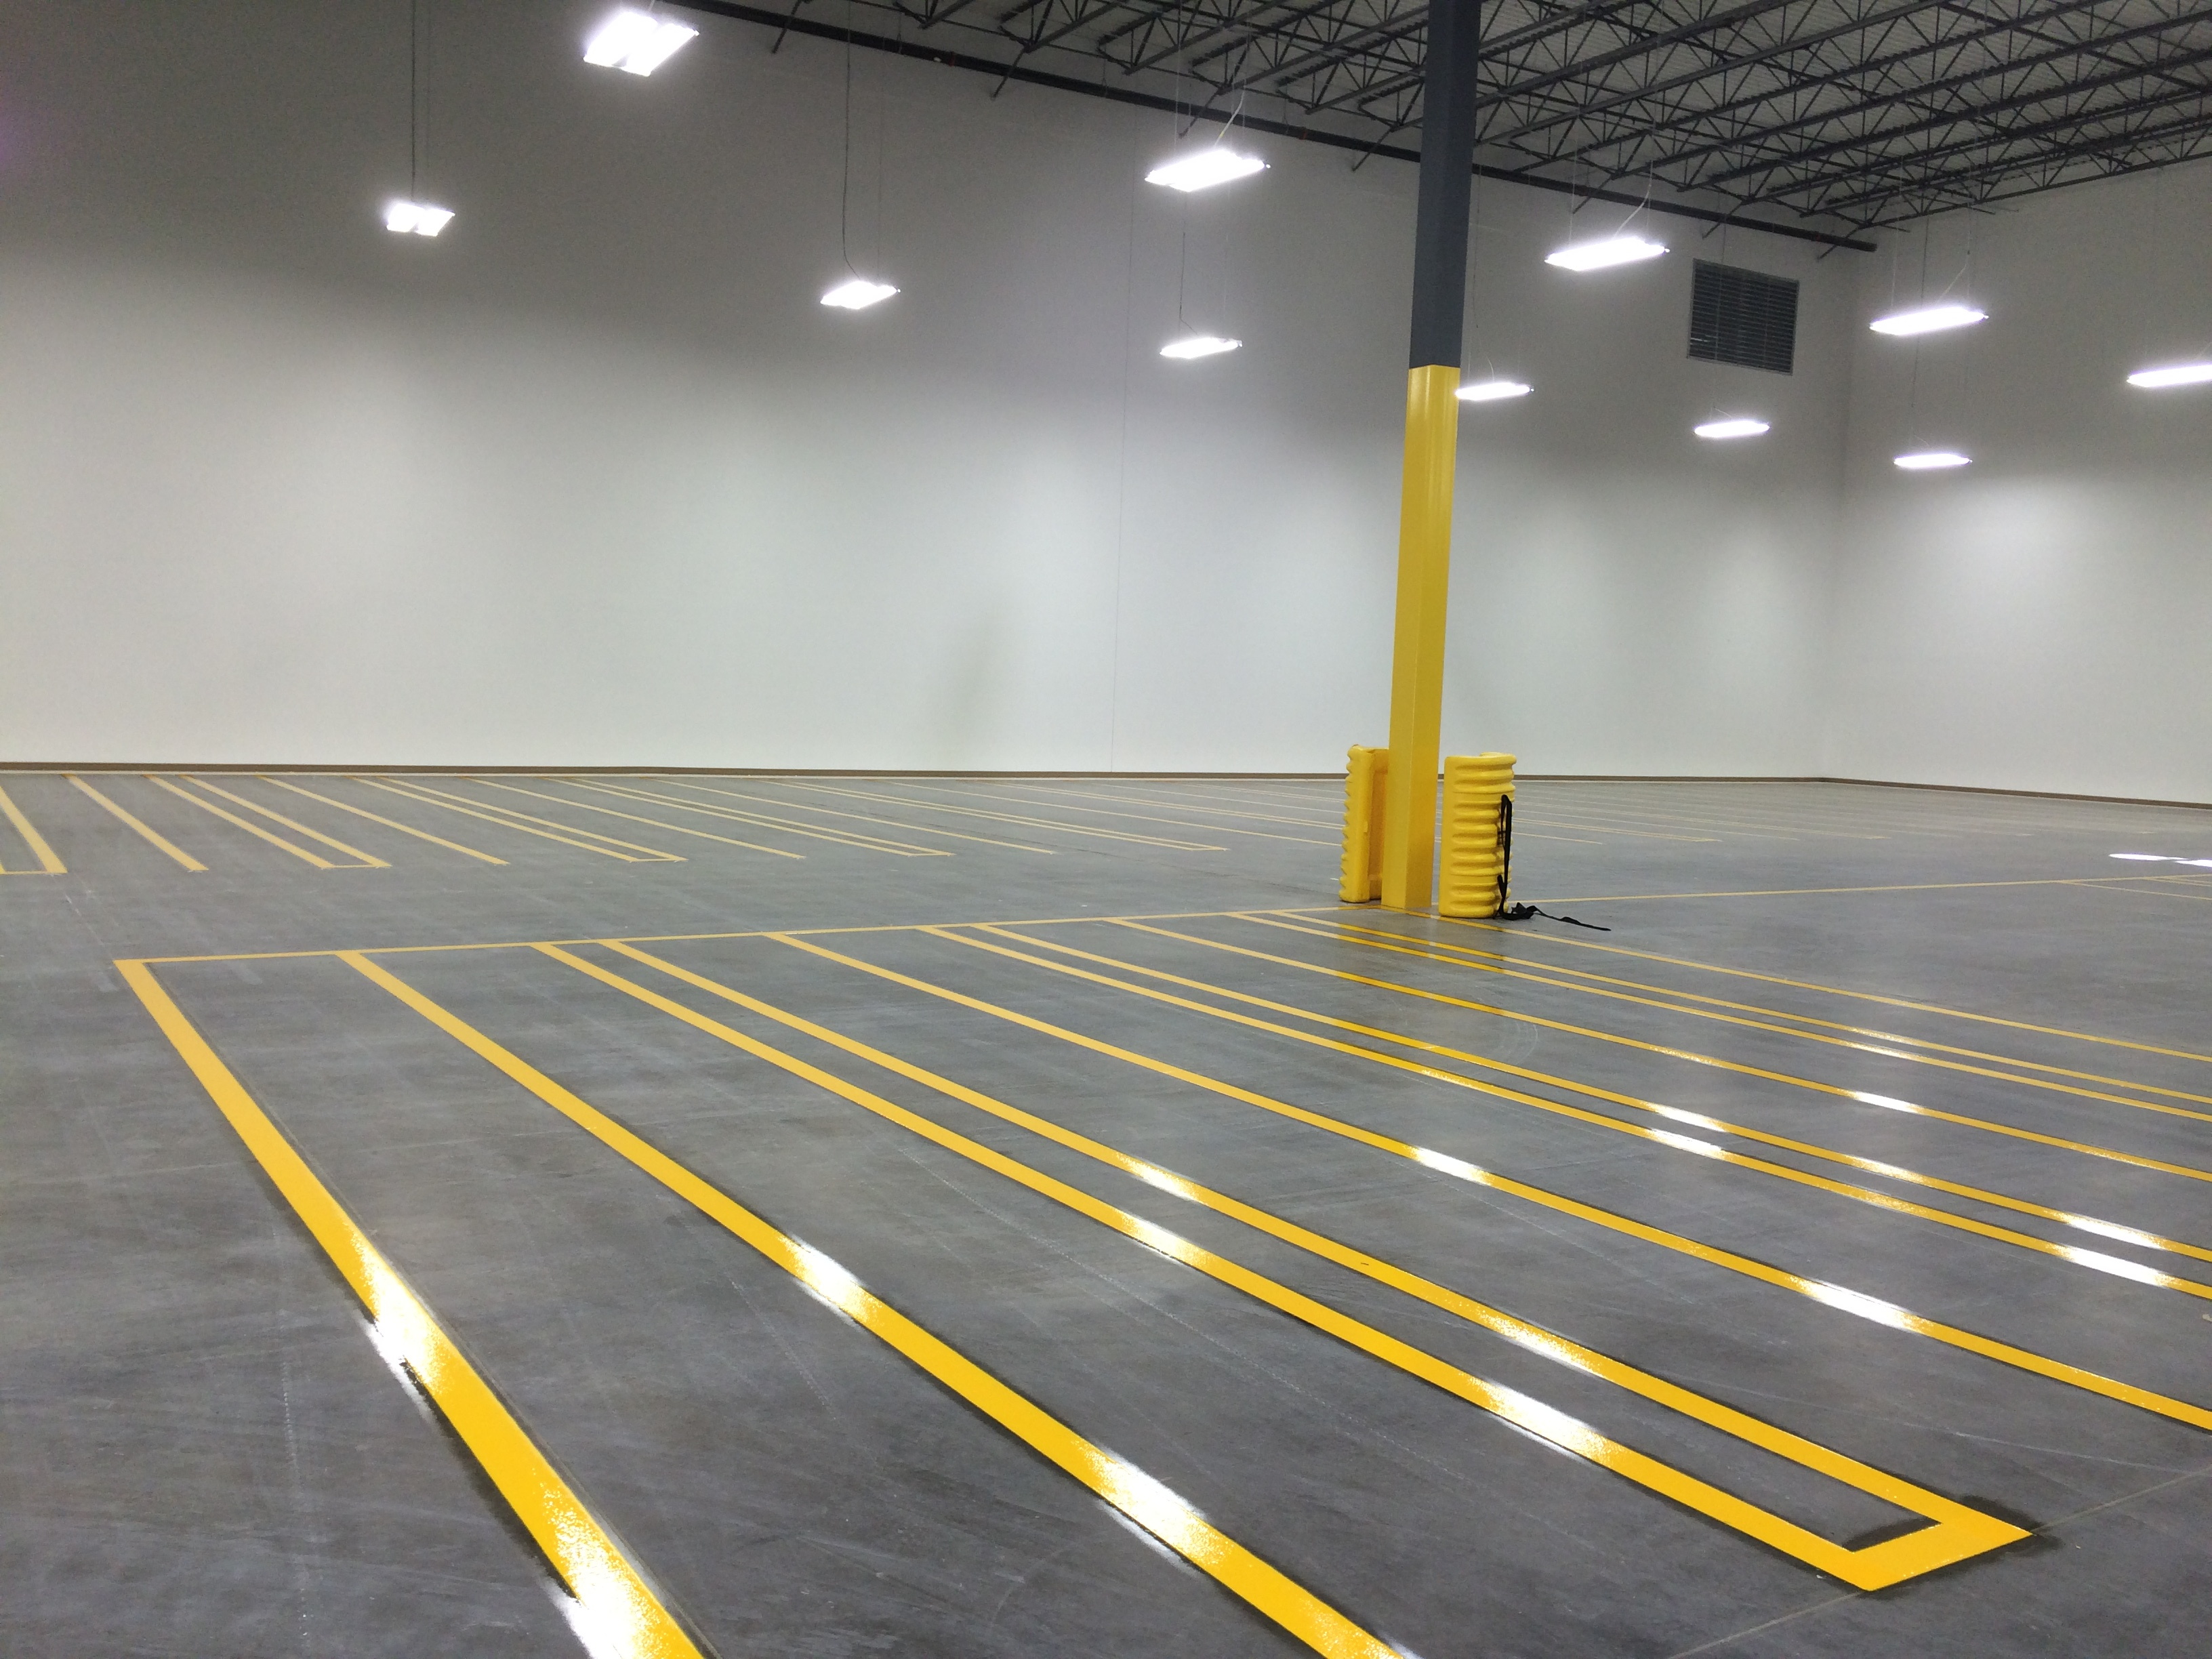 Warehouse Striping Stripe A Zone